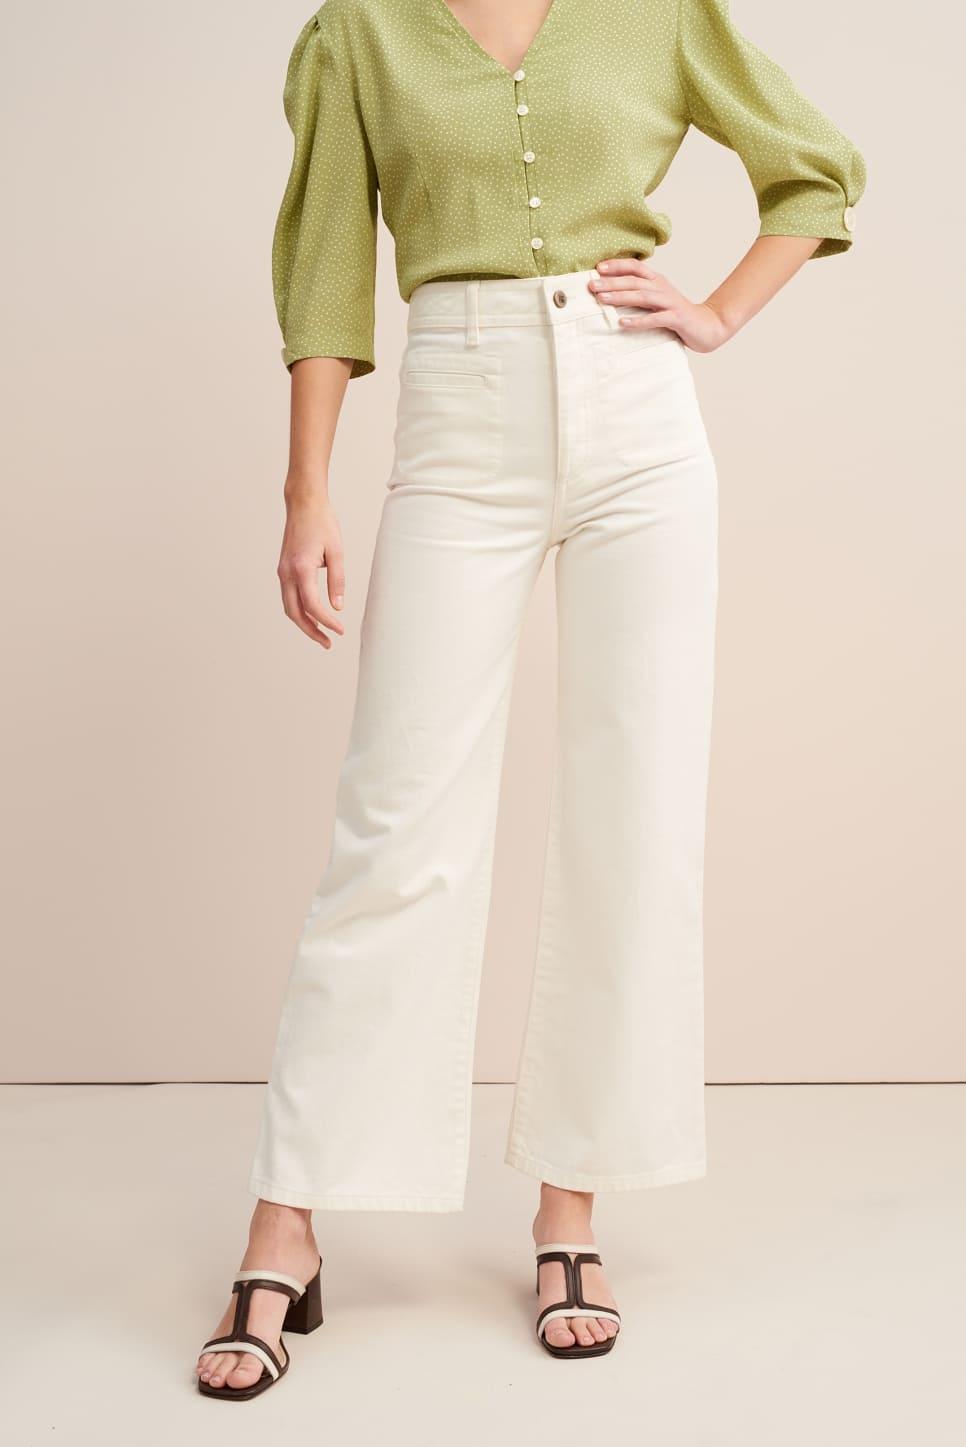 SWAN jeans